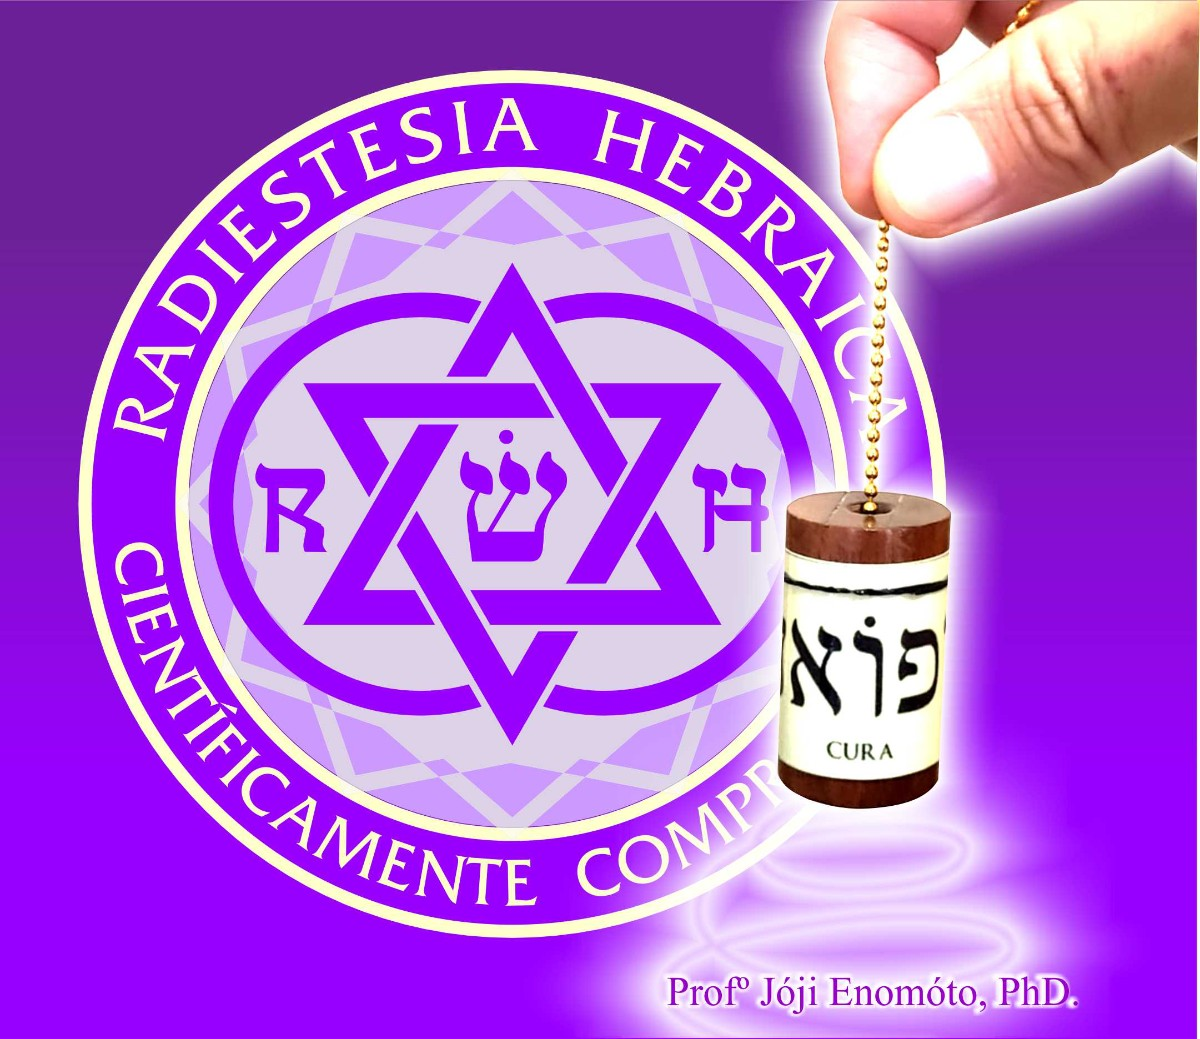 radiestesia hebraica